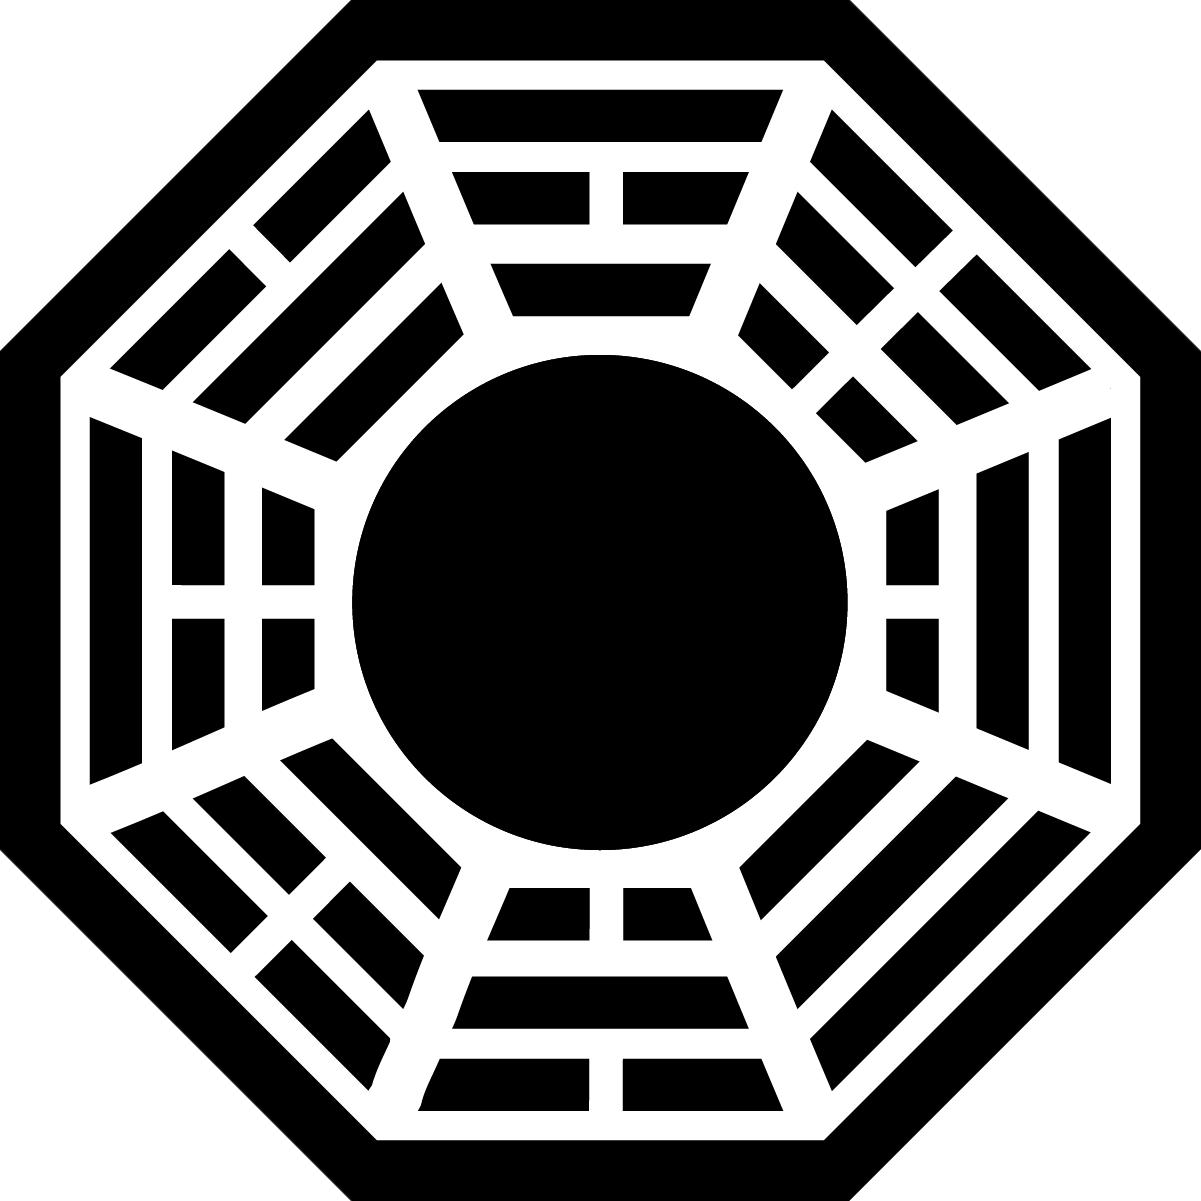 lost springs buddhist singles Guifeng zongmi (chinese: 圭峰 宗密 pinyin: guīfēng zōngmì japanese pronunciation: keihō shūmitsu) (780–841) was a tang dynasty buddhist scholar and bhikkhu, installed as fifth patriarch of the huayan school as well as a patriarch of the heze school of southern chan buddhism zongmi was deeply affected by both chan and huayan.